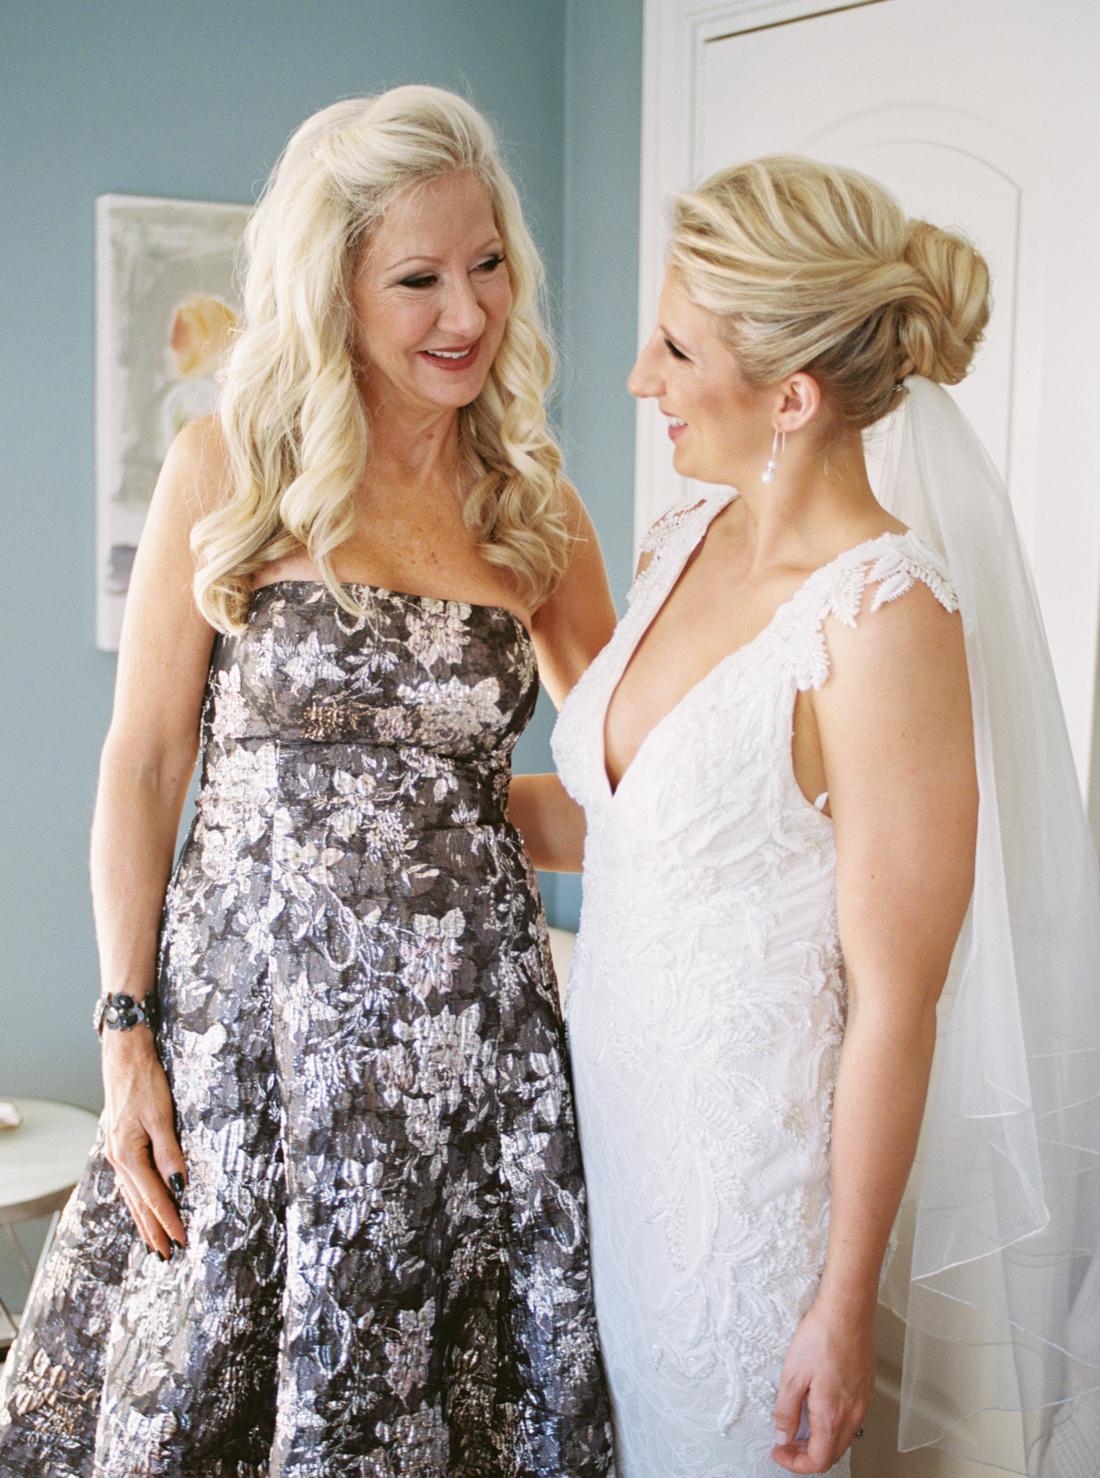 severna-park-wedding-getting-ready-kelsey